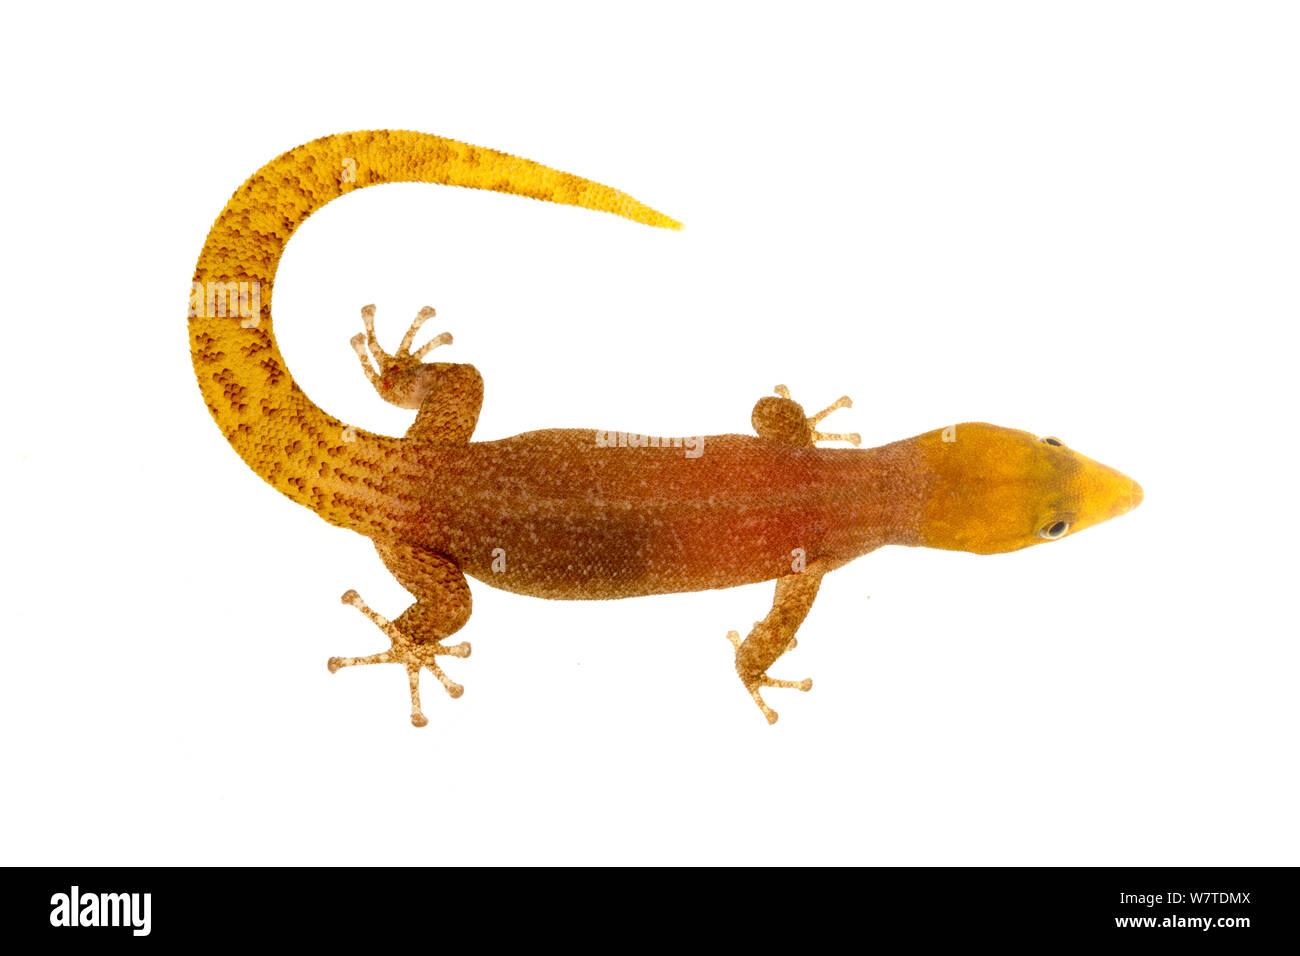 Sphaerodactylus homolepis Isla Colon, Panama. Projet d'Meetyourneighbors.net Banque D'Images